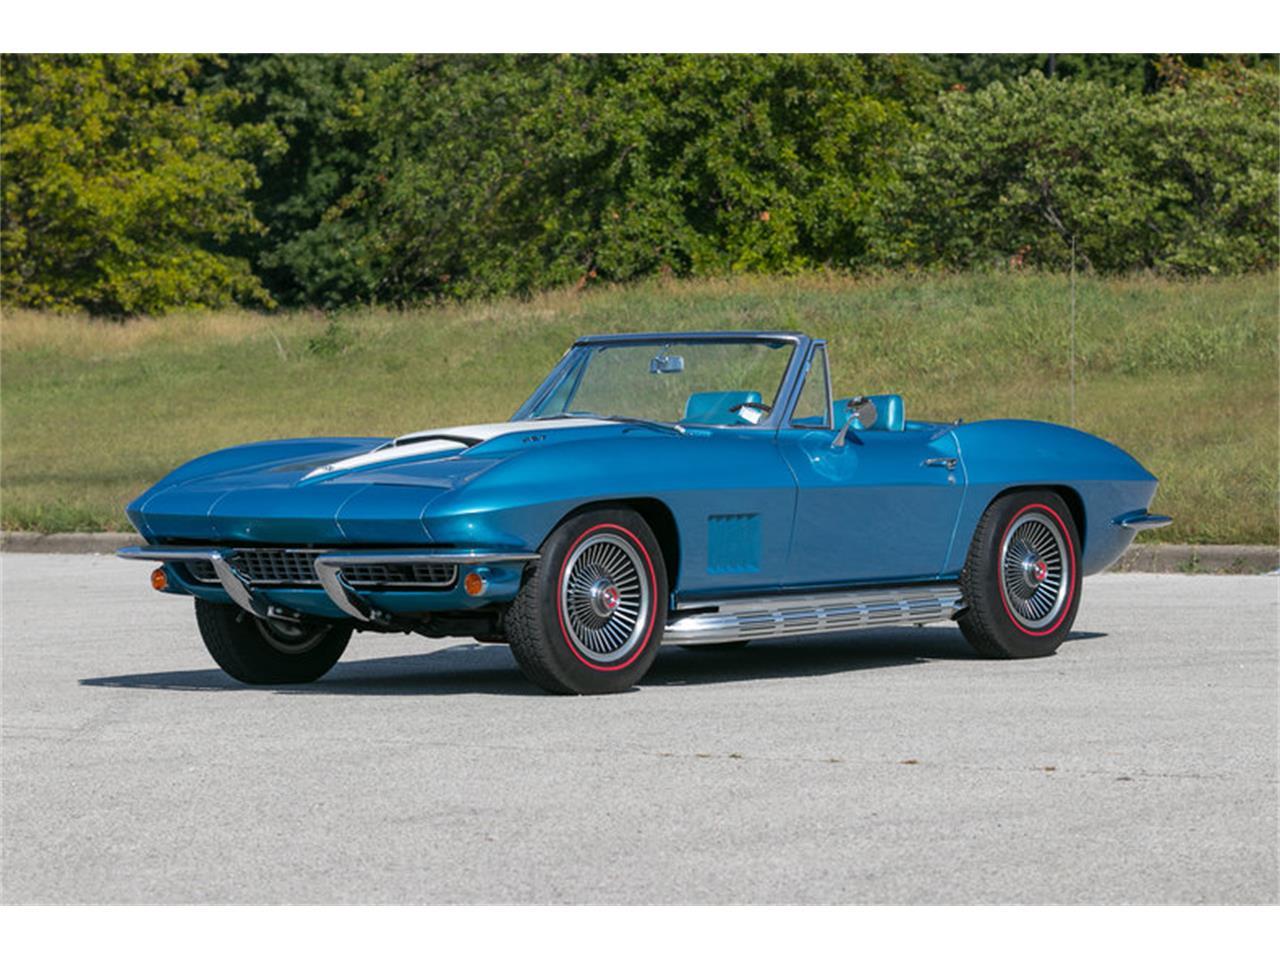 Large Picture of 1967 Chevrolet Corvette - $99,995.00 - MDUJ